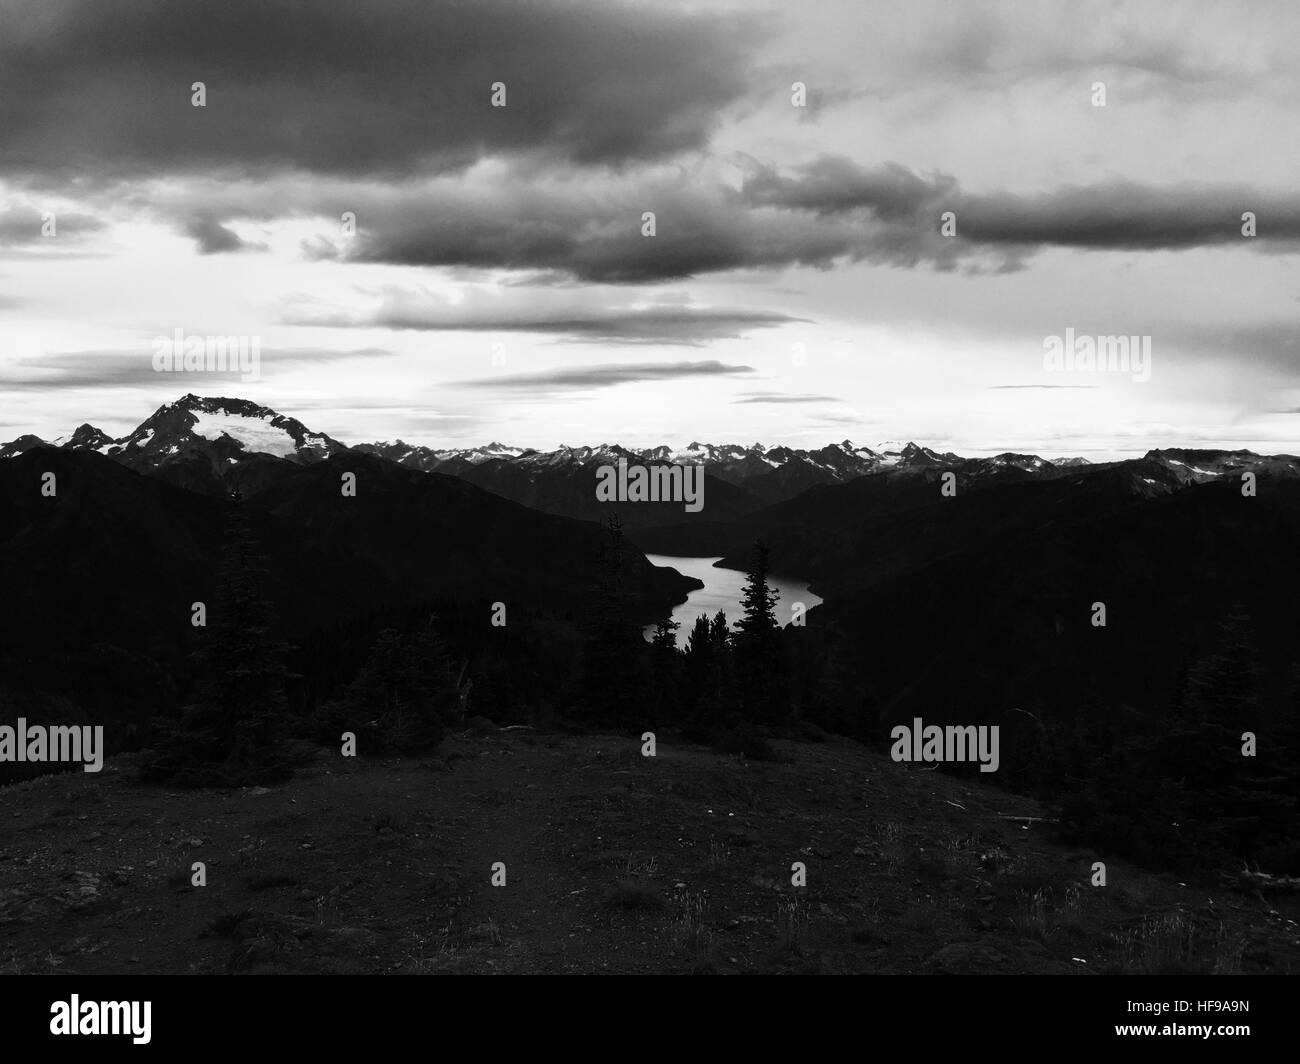 North Cascades National Park, Washington: Ross Lake view from Desolation Peak - Stock Image